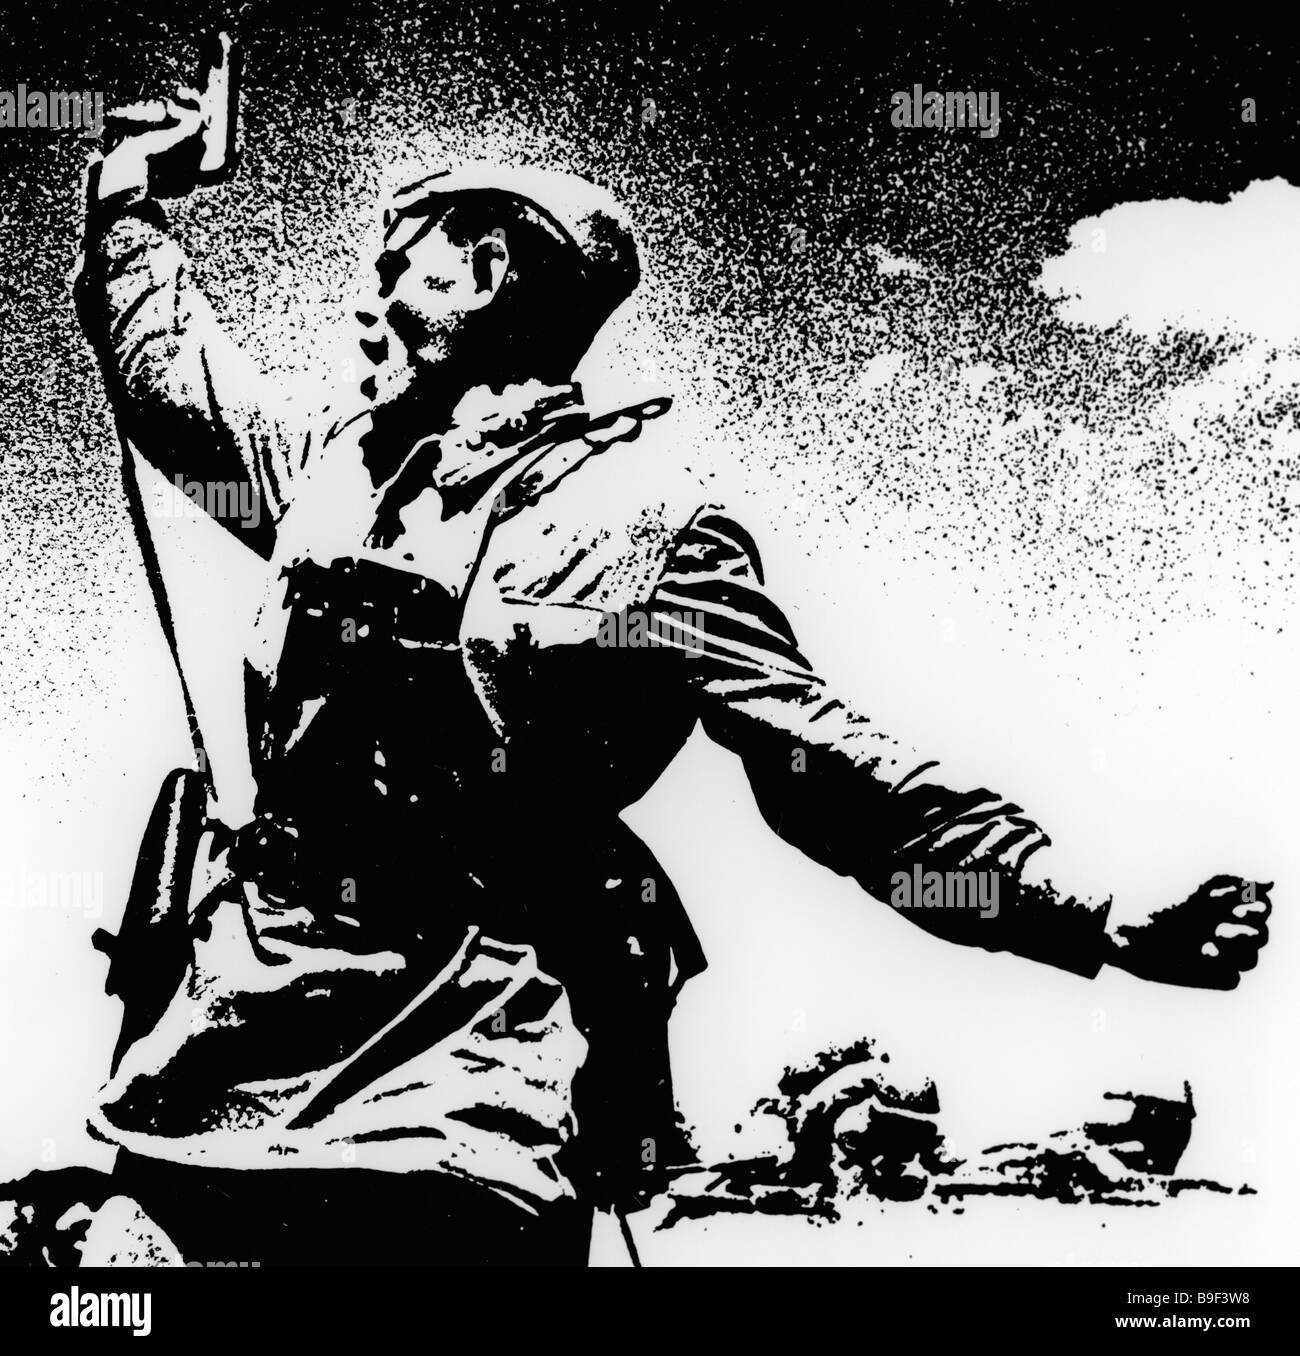 Foto-Grafik von I Zotin gemacht von Max Alpert Battalion commander Stockbild